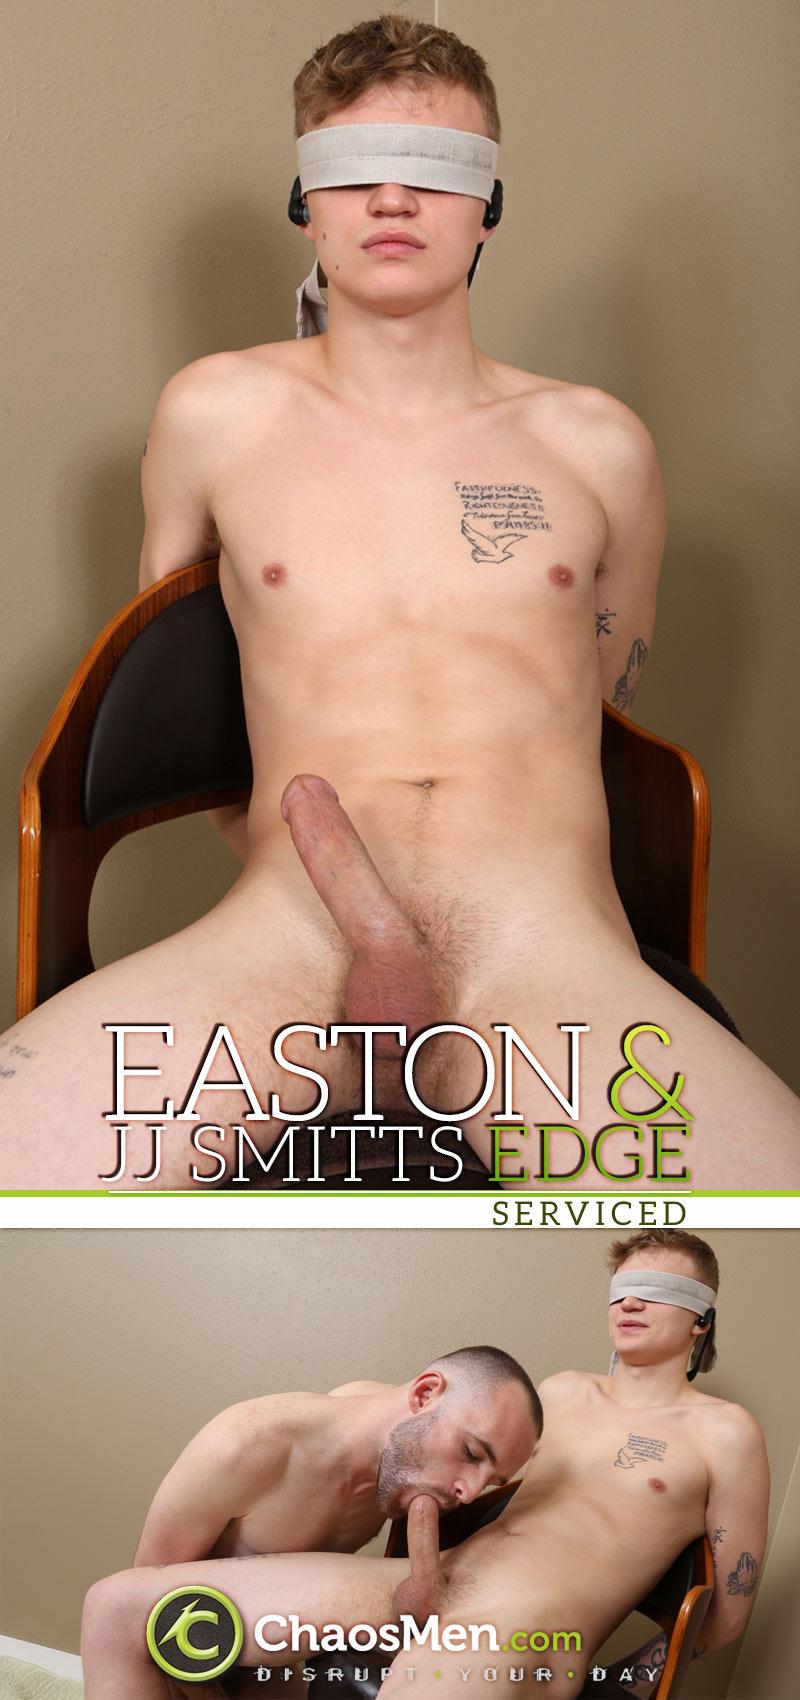 Easton & JJ Smitts 'Edge' at ChaosMen